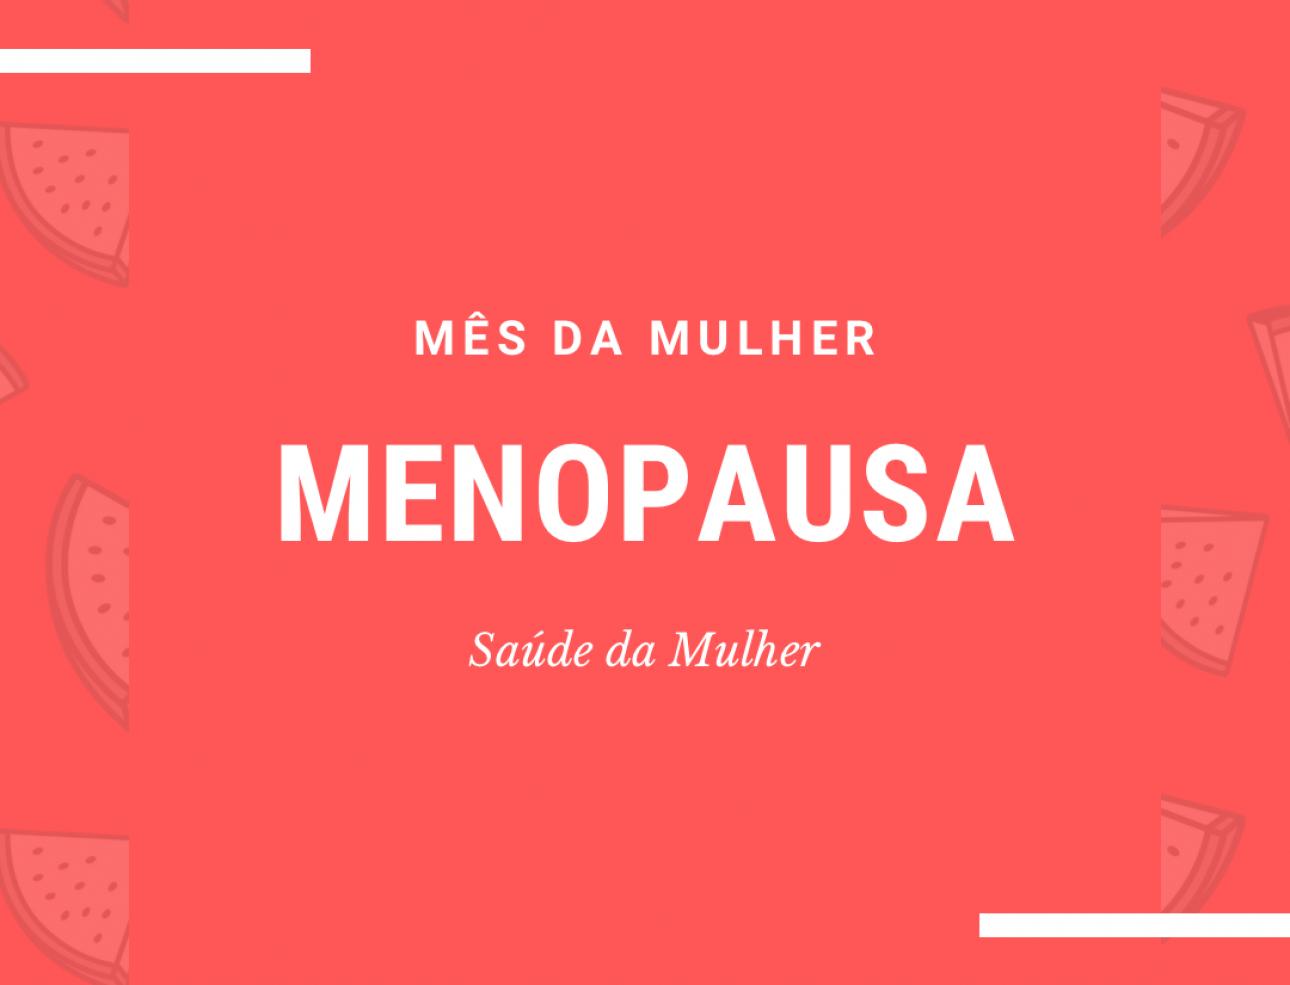 mês da mulher menopausa